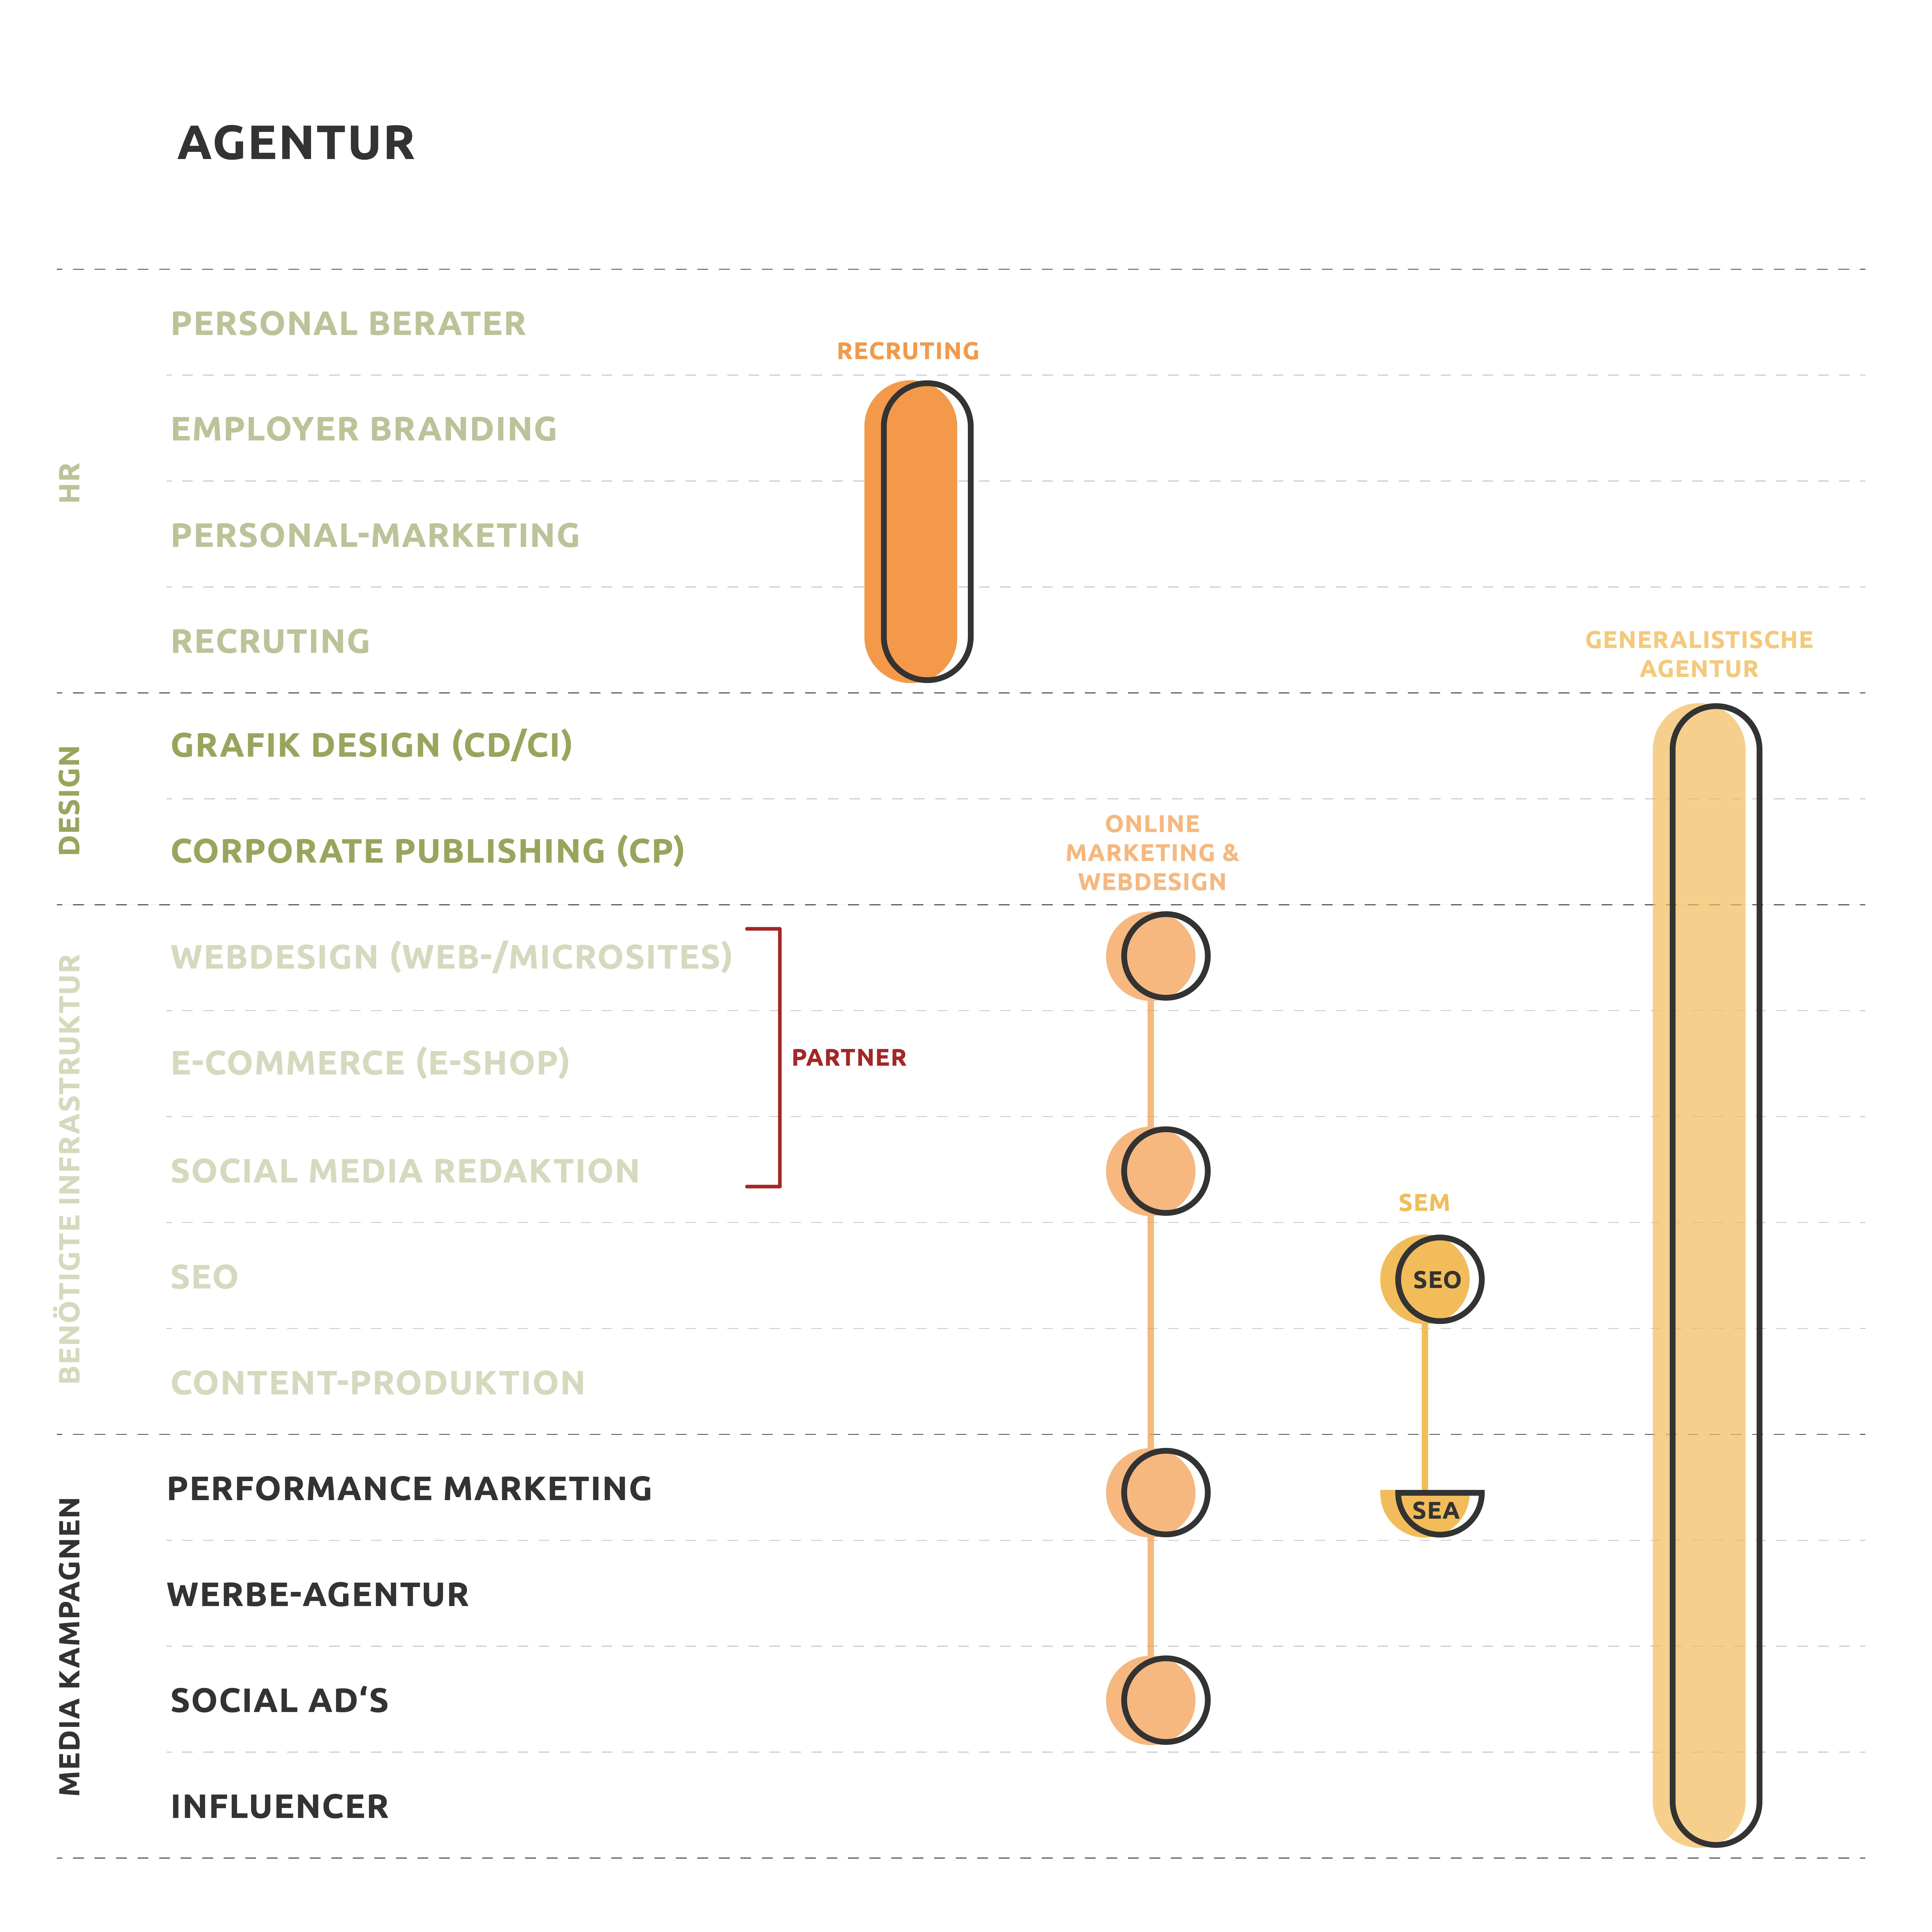 Artikel-26_Agenturarten-Grafik